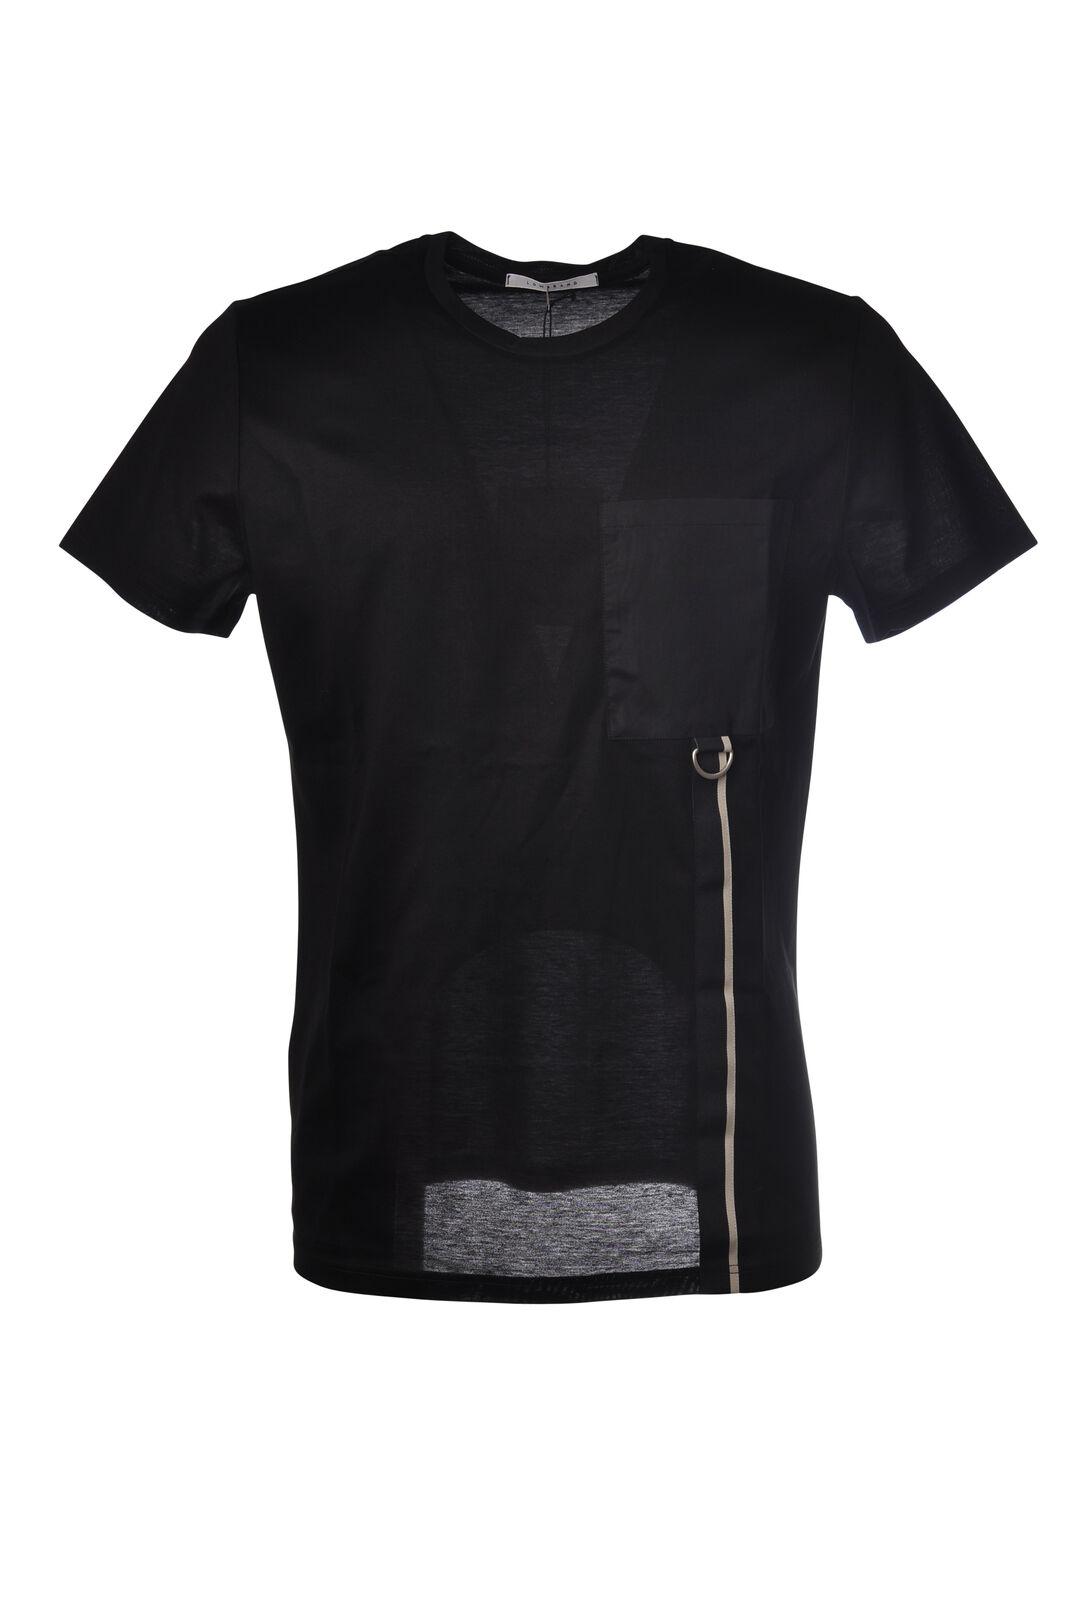 Niedrig Brand - Topwear-T-shirts - Mann - Schwarz - 5252325I185341